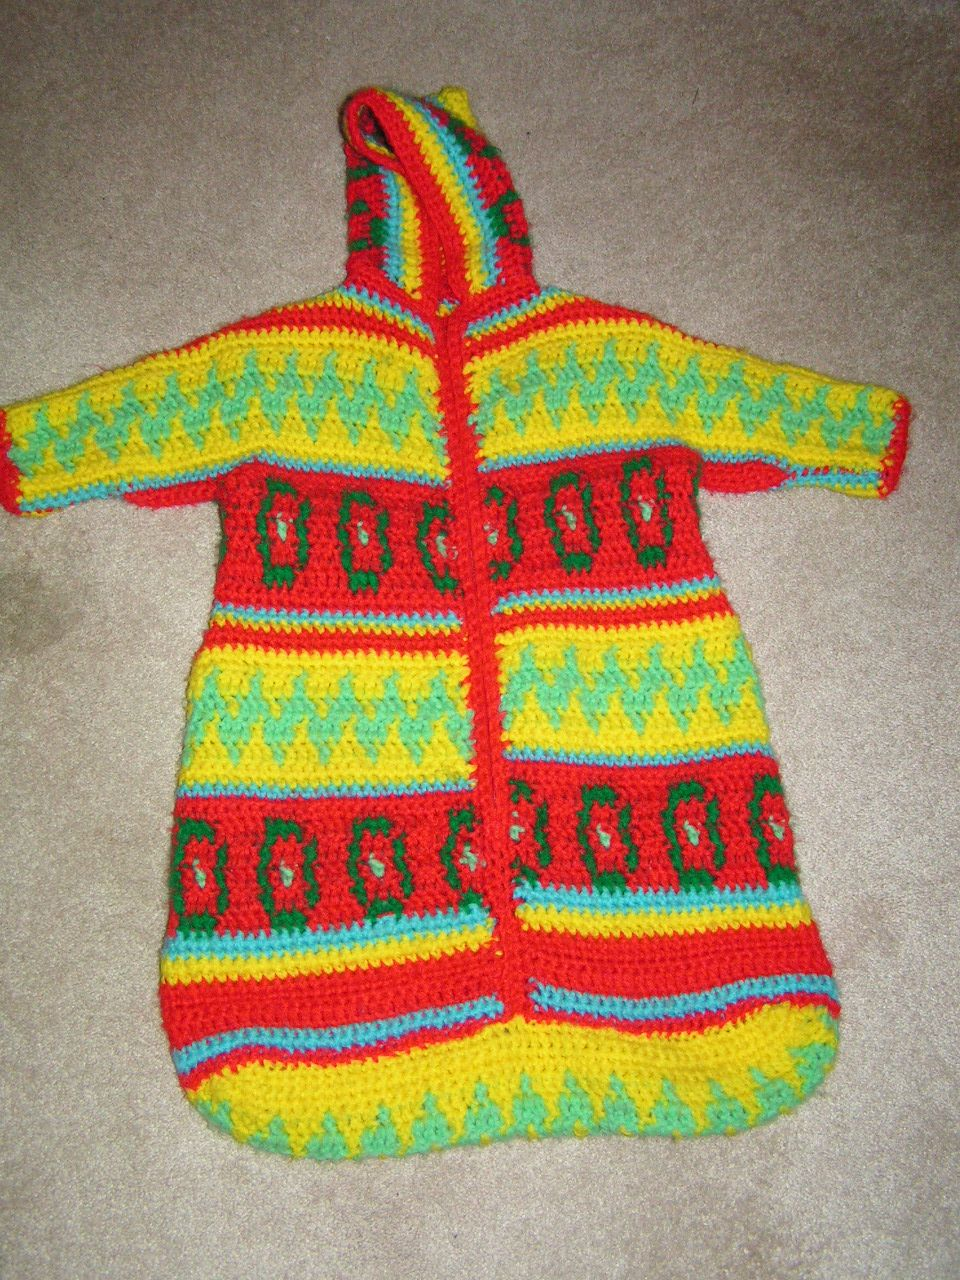 10aff9d49 Hippie Baby Bunting - 1972